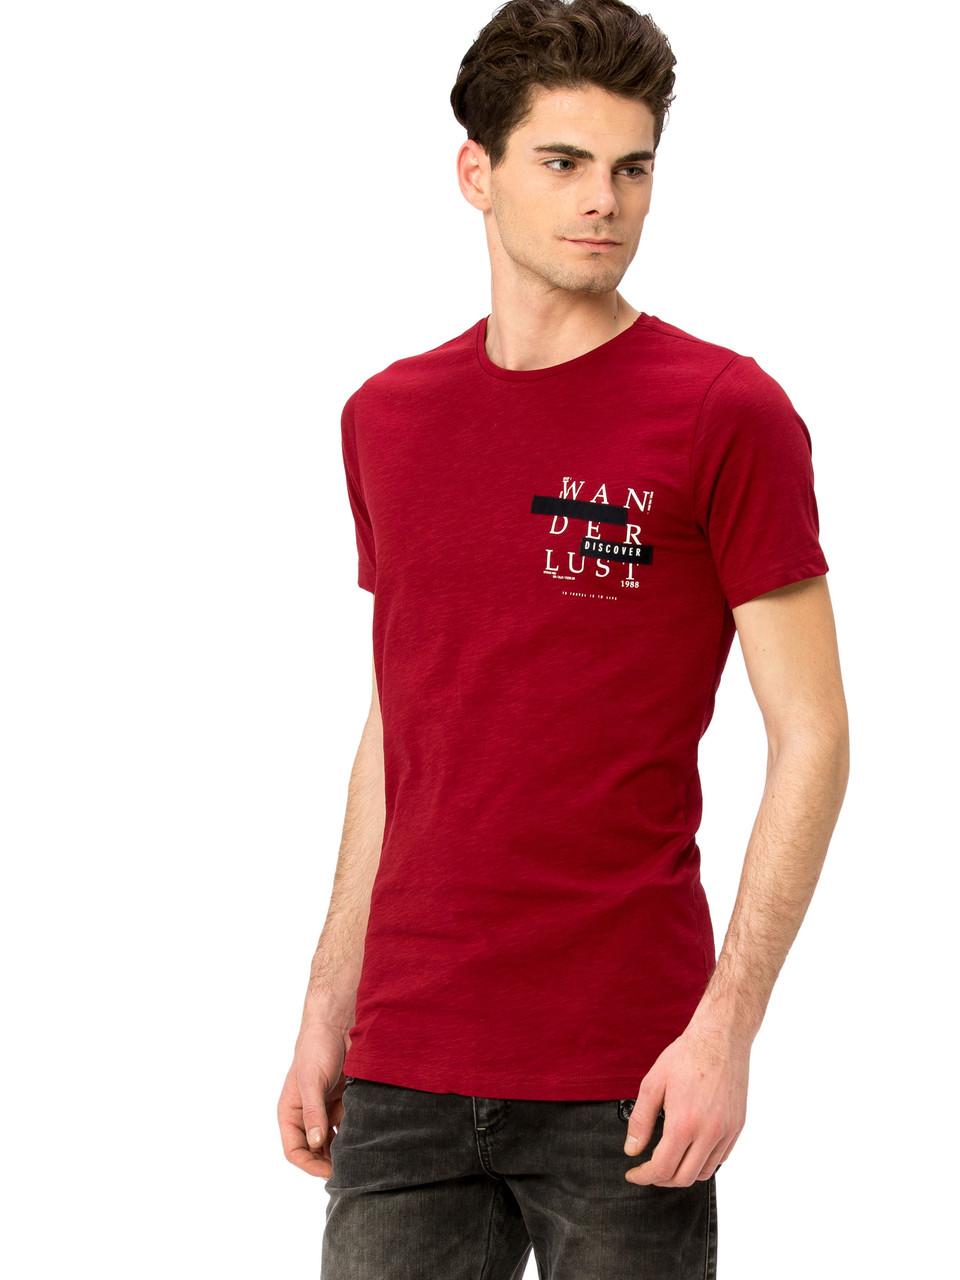 Бордовая мужская футболка LC Waikiki / ЛС Вайкики с надписью Wanderlust